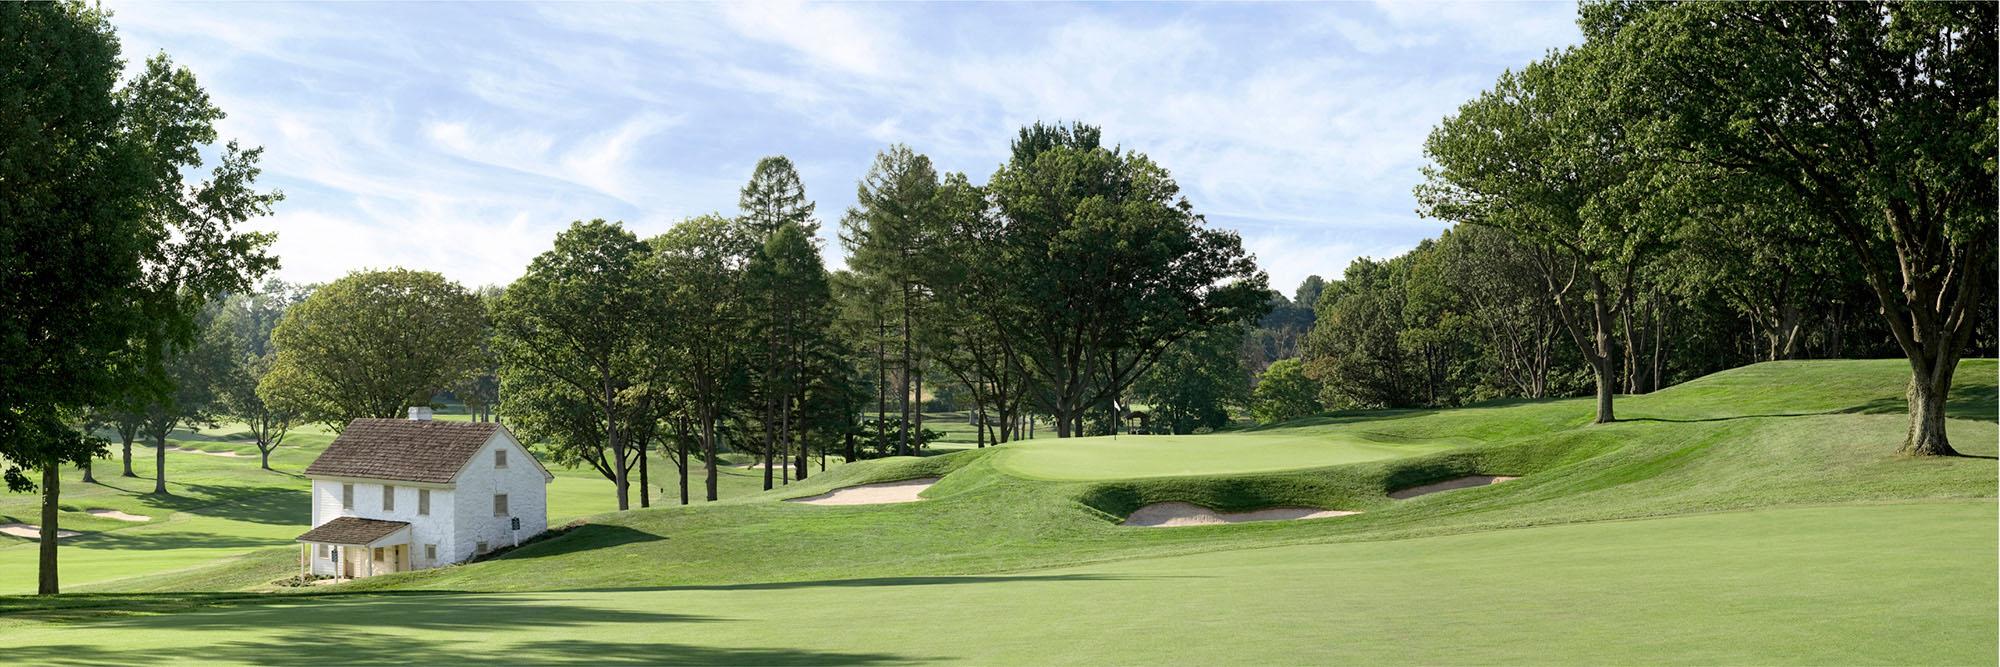 Golf Course Image - Aronimink No. 7